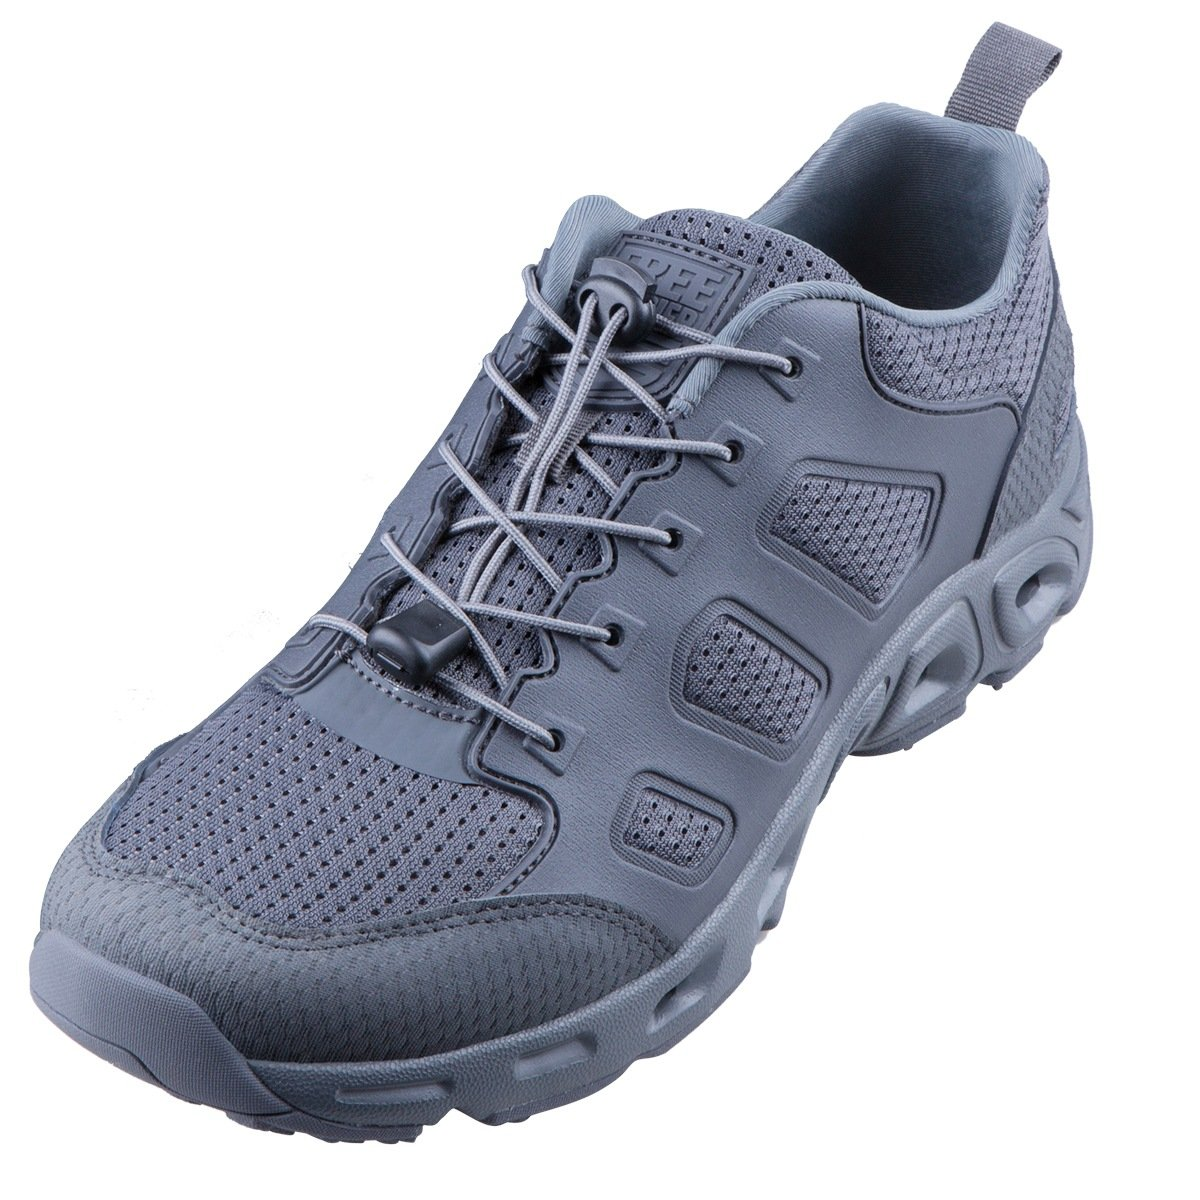 FREE SOLDIER Zapatos de Senderismo Tácticos para Hombre, ultraligeros, Transpirables, de Secado Rápido, para Exteriores(Gris, 39) 39|Gris